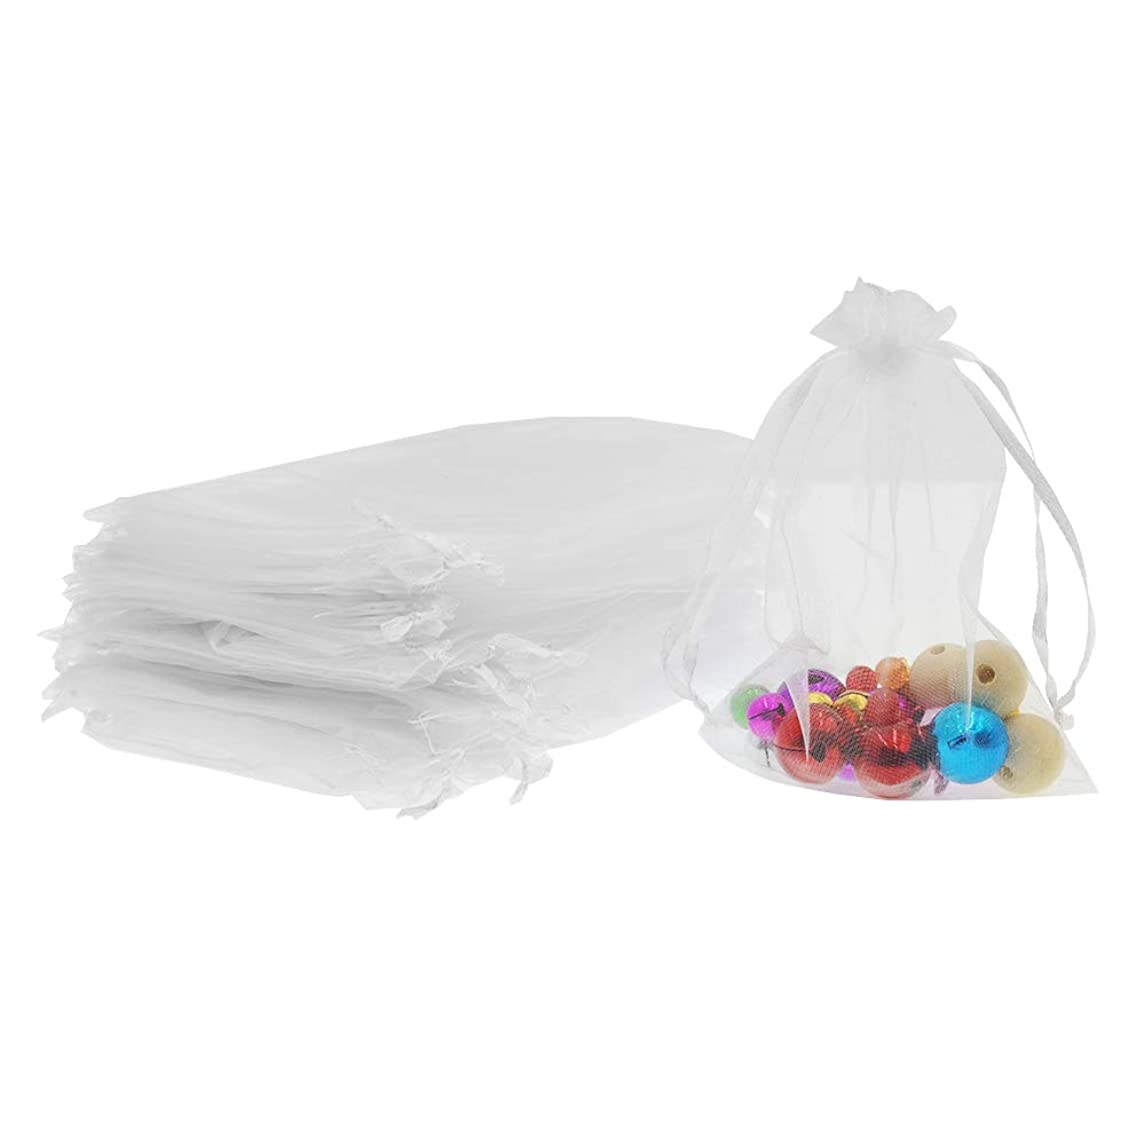 Lautechco 100Pcs Organza Bags 7x9 inches White Organza Gift Bags Small Mesh Bags Drawstring Gift Bags Christmas Drawstring Organza Gift Bags (7x9 inches White)